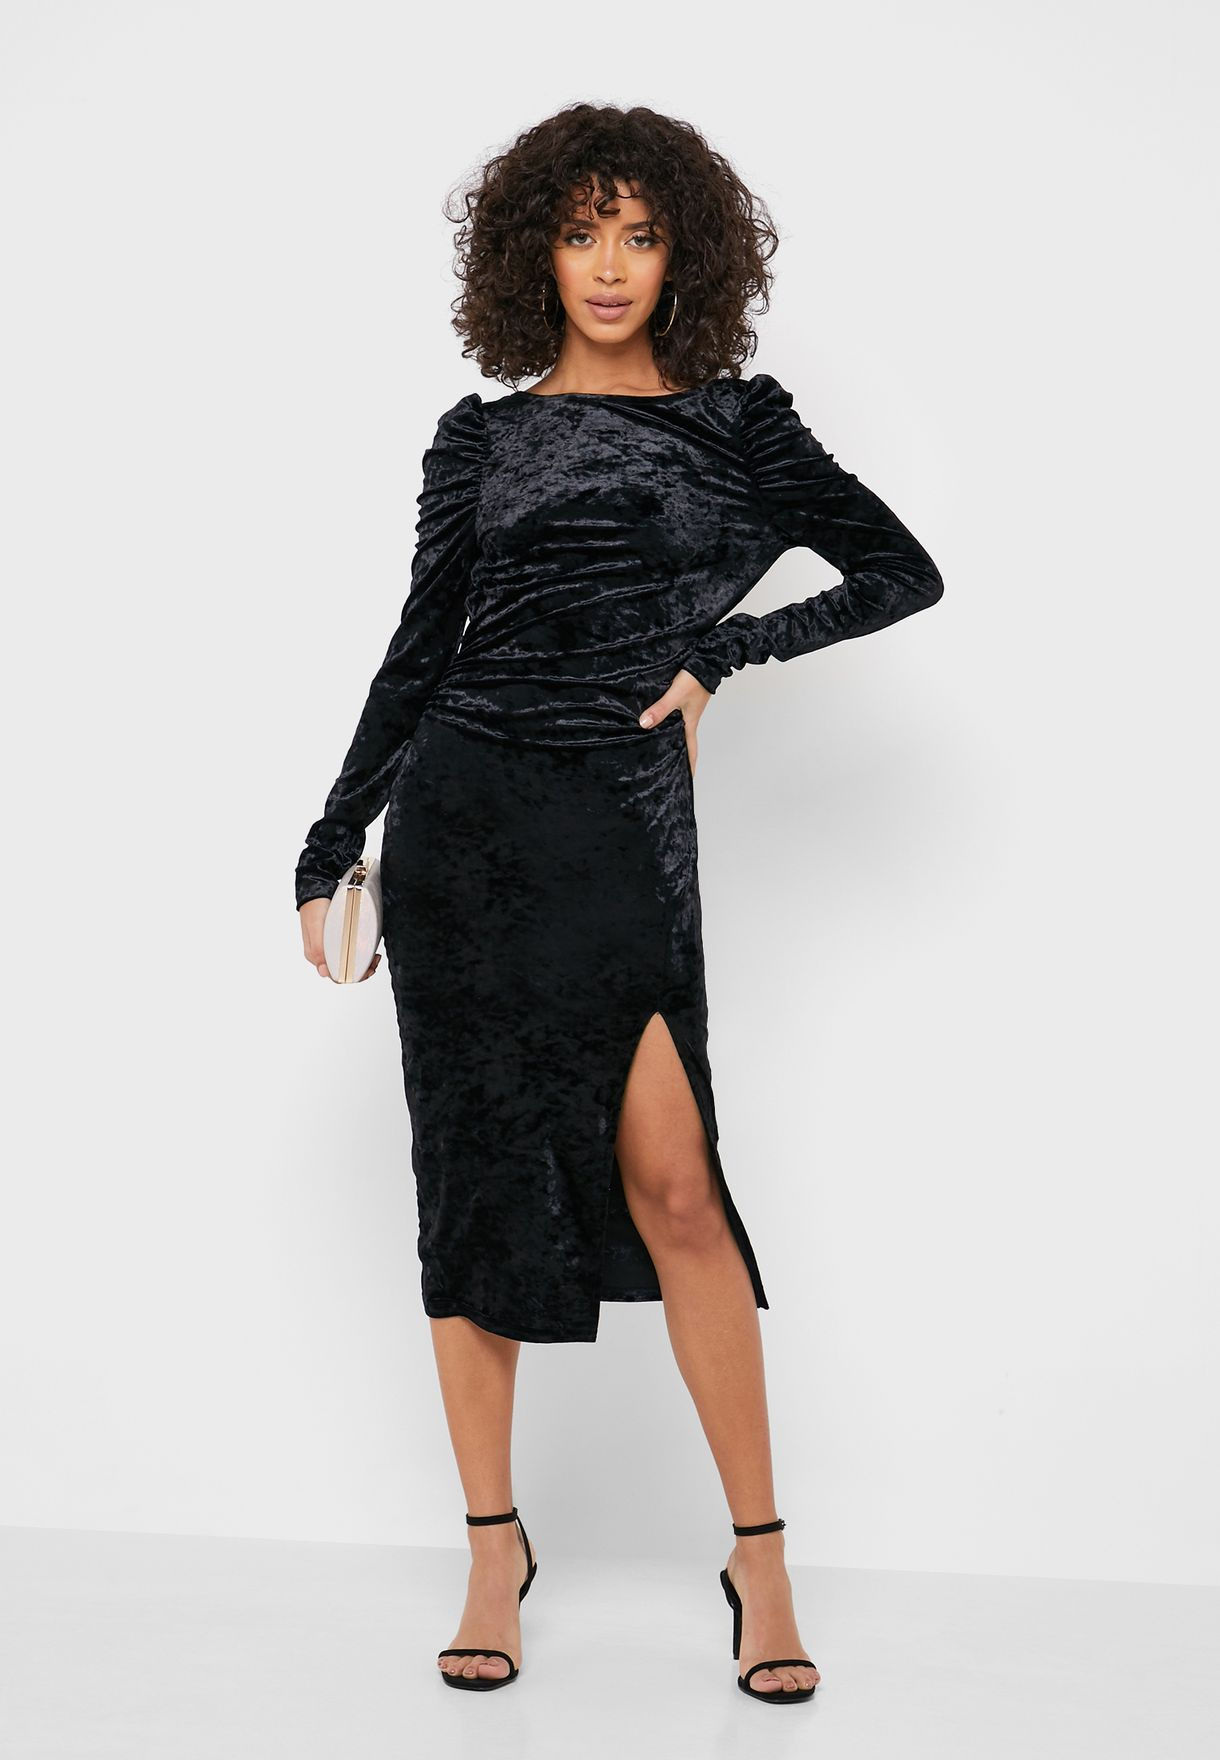 Buy Dorothy Perkins Black Puff Sleeve Side Slit Dress For Women, Uae 18832at89zfp